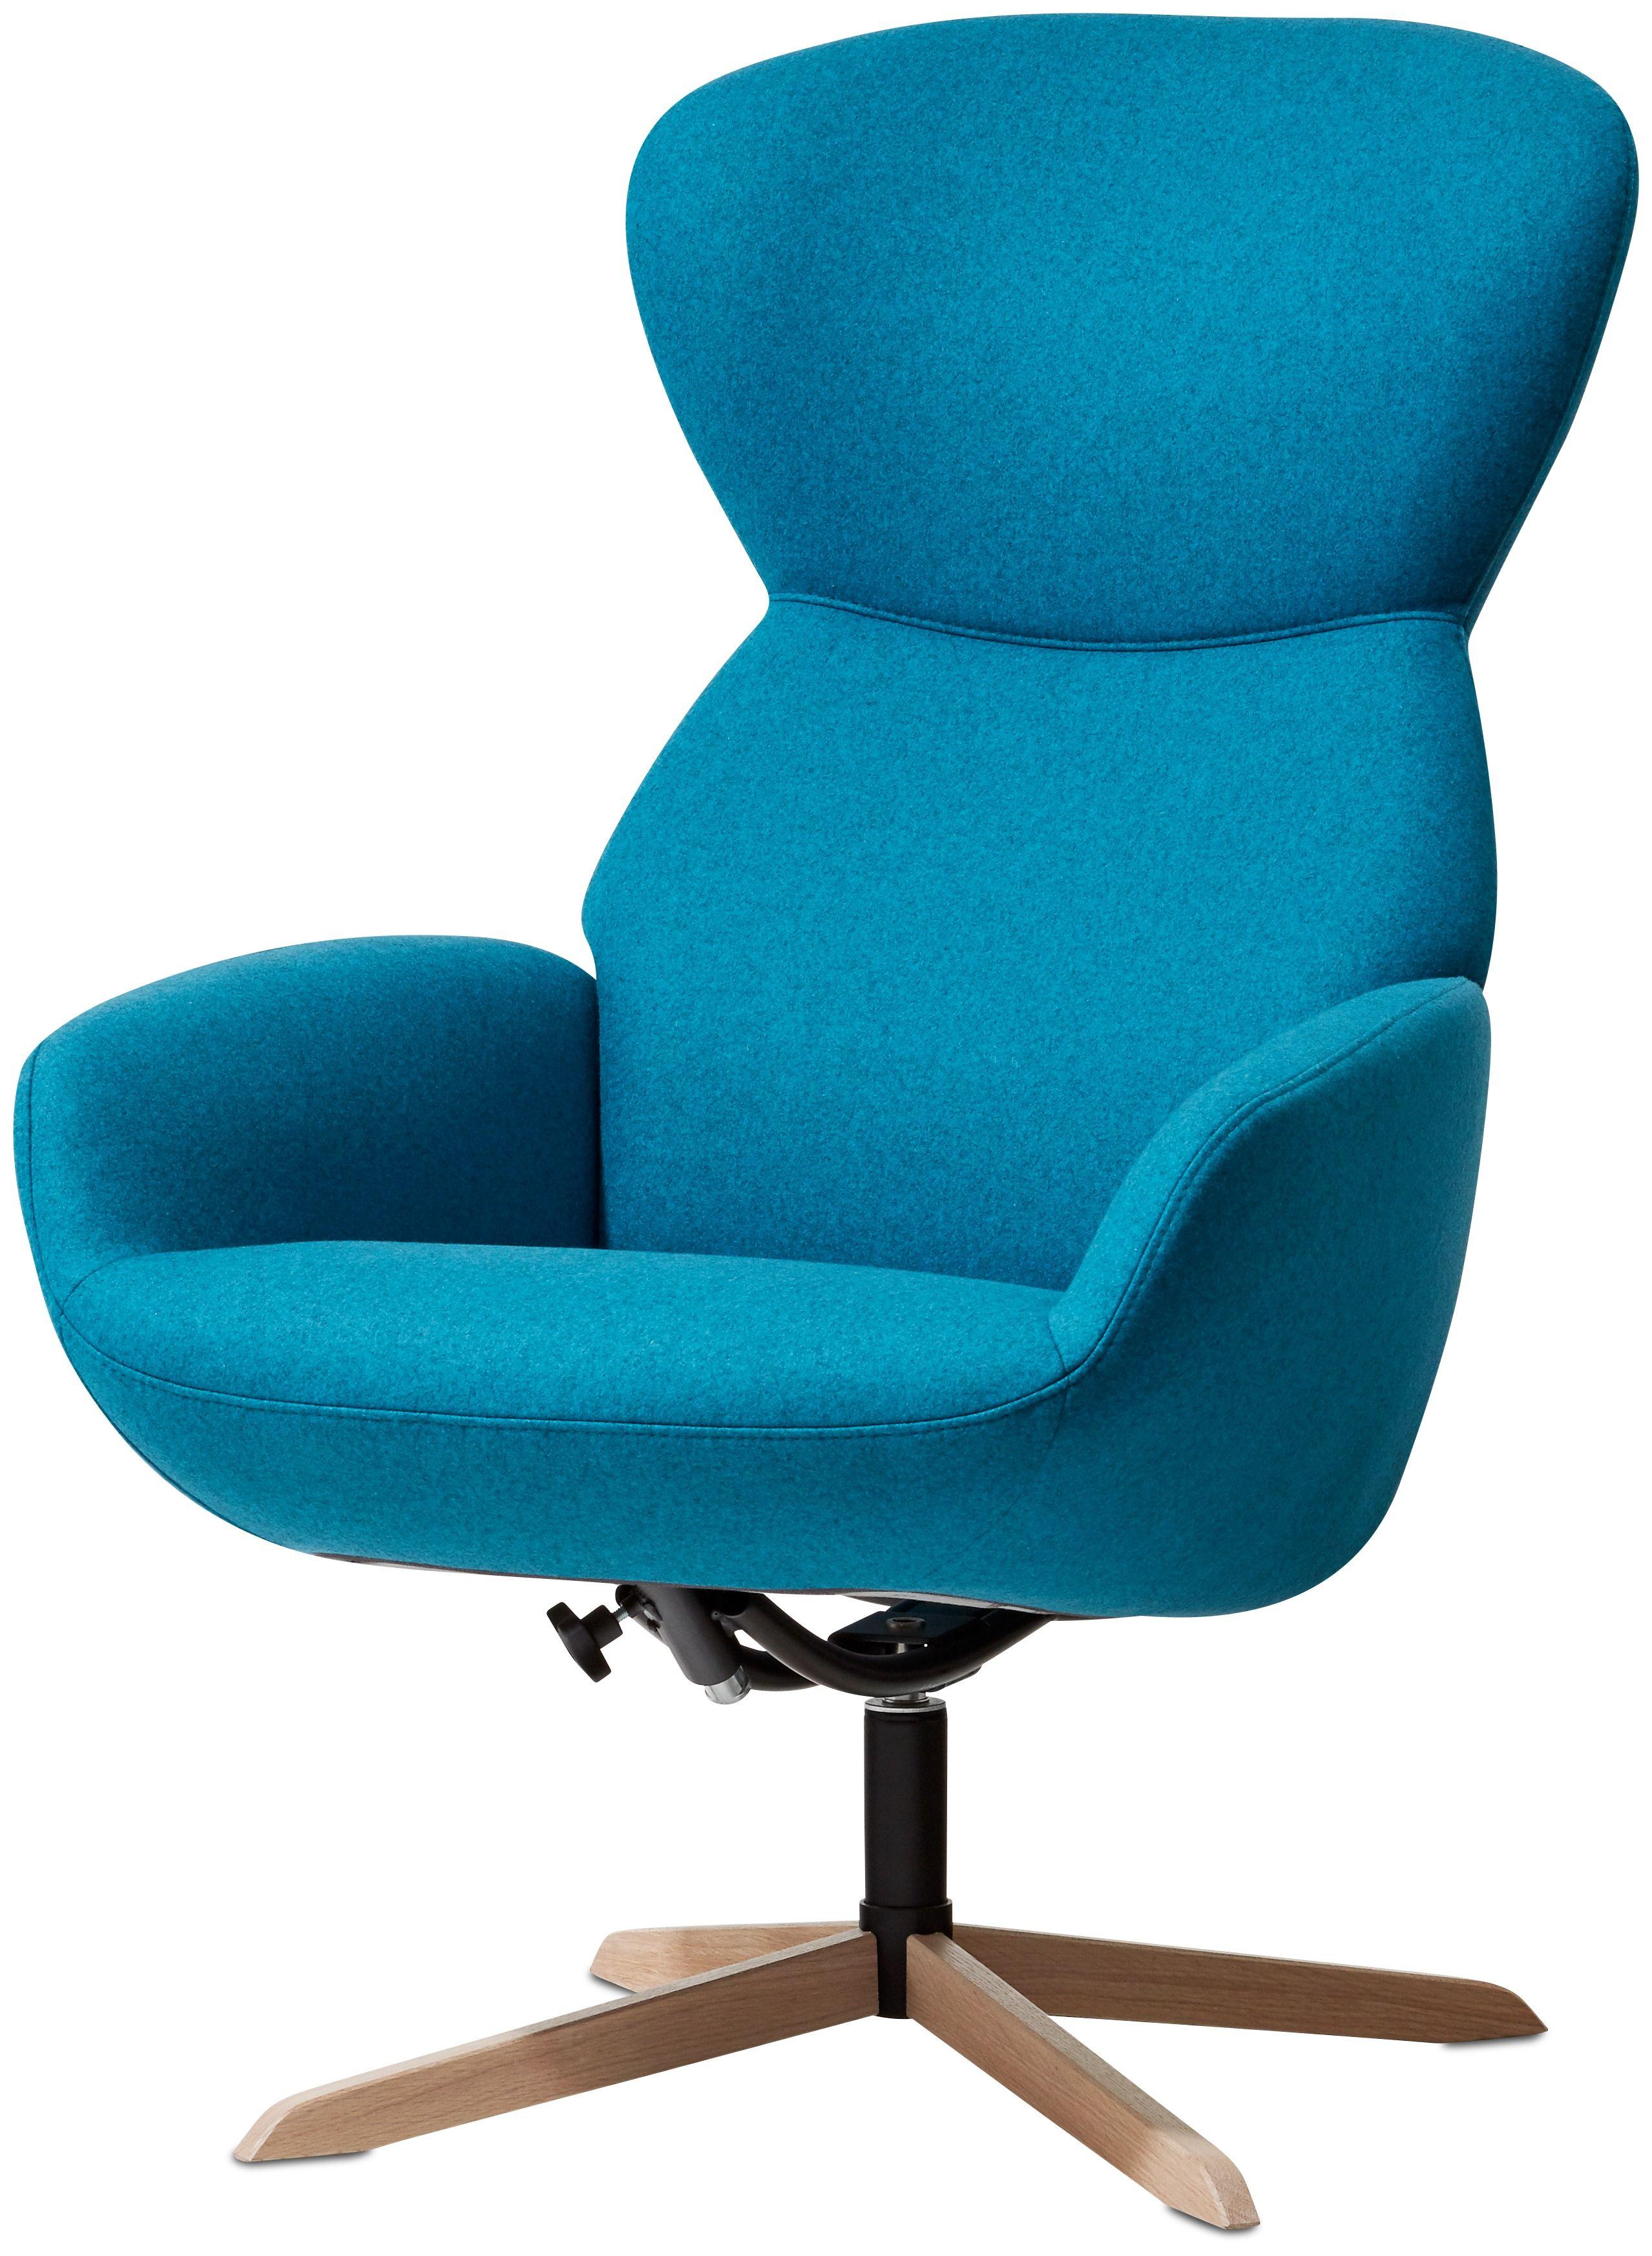 Athena Sessel mit Kippfunktion und Drehsockel   Sessel ...